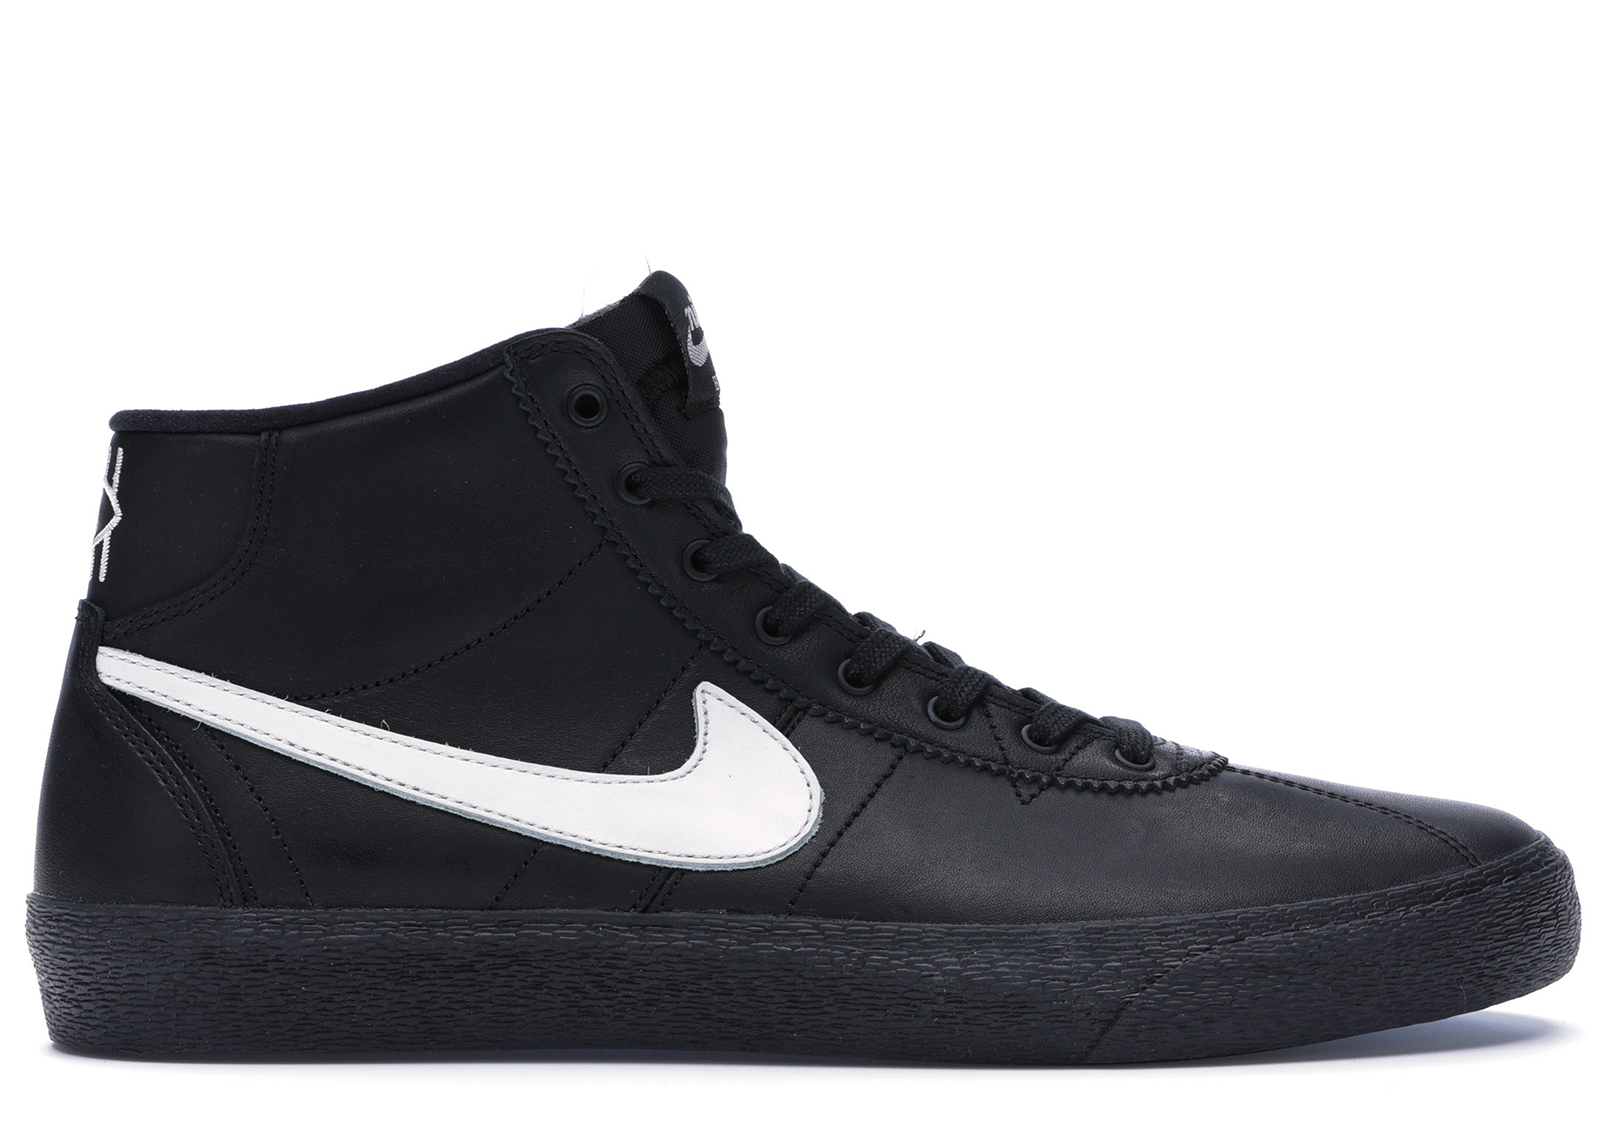 Nike SB Bruin High Lacey Baker (W